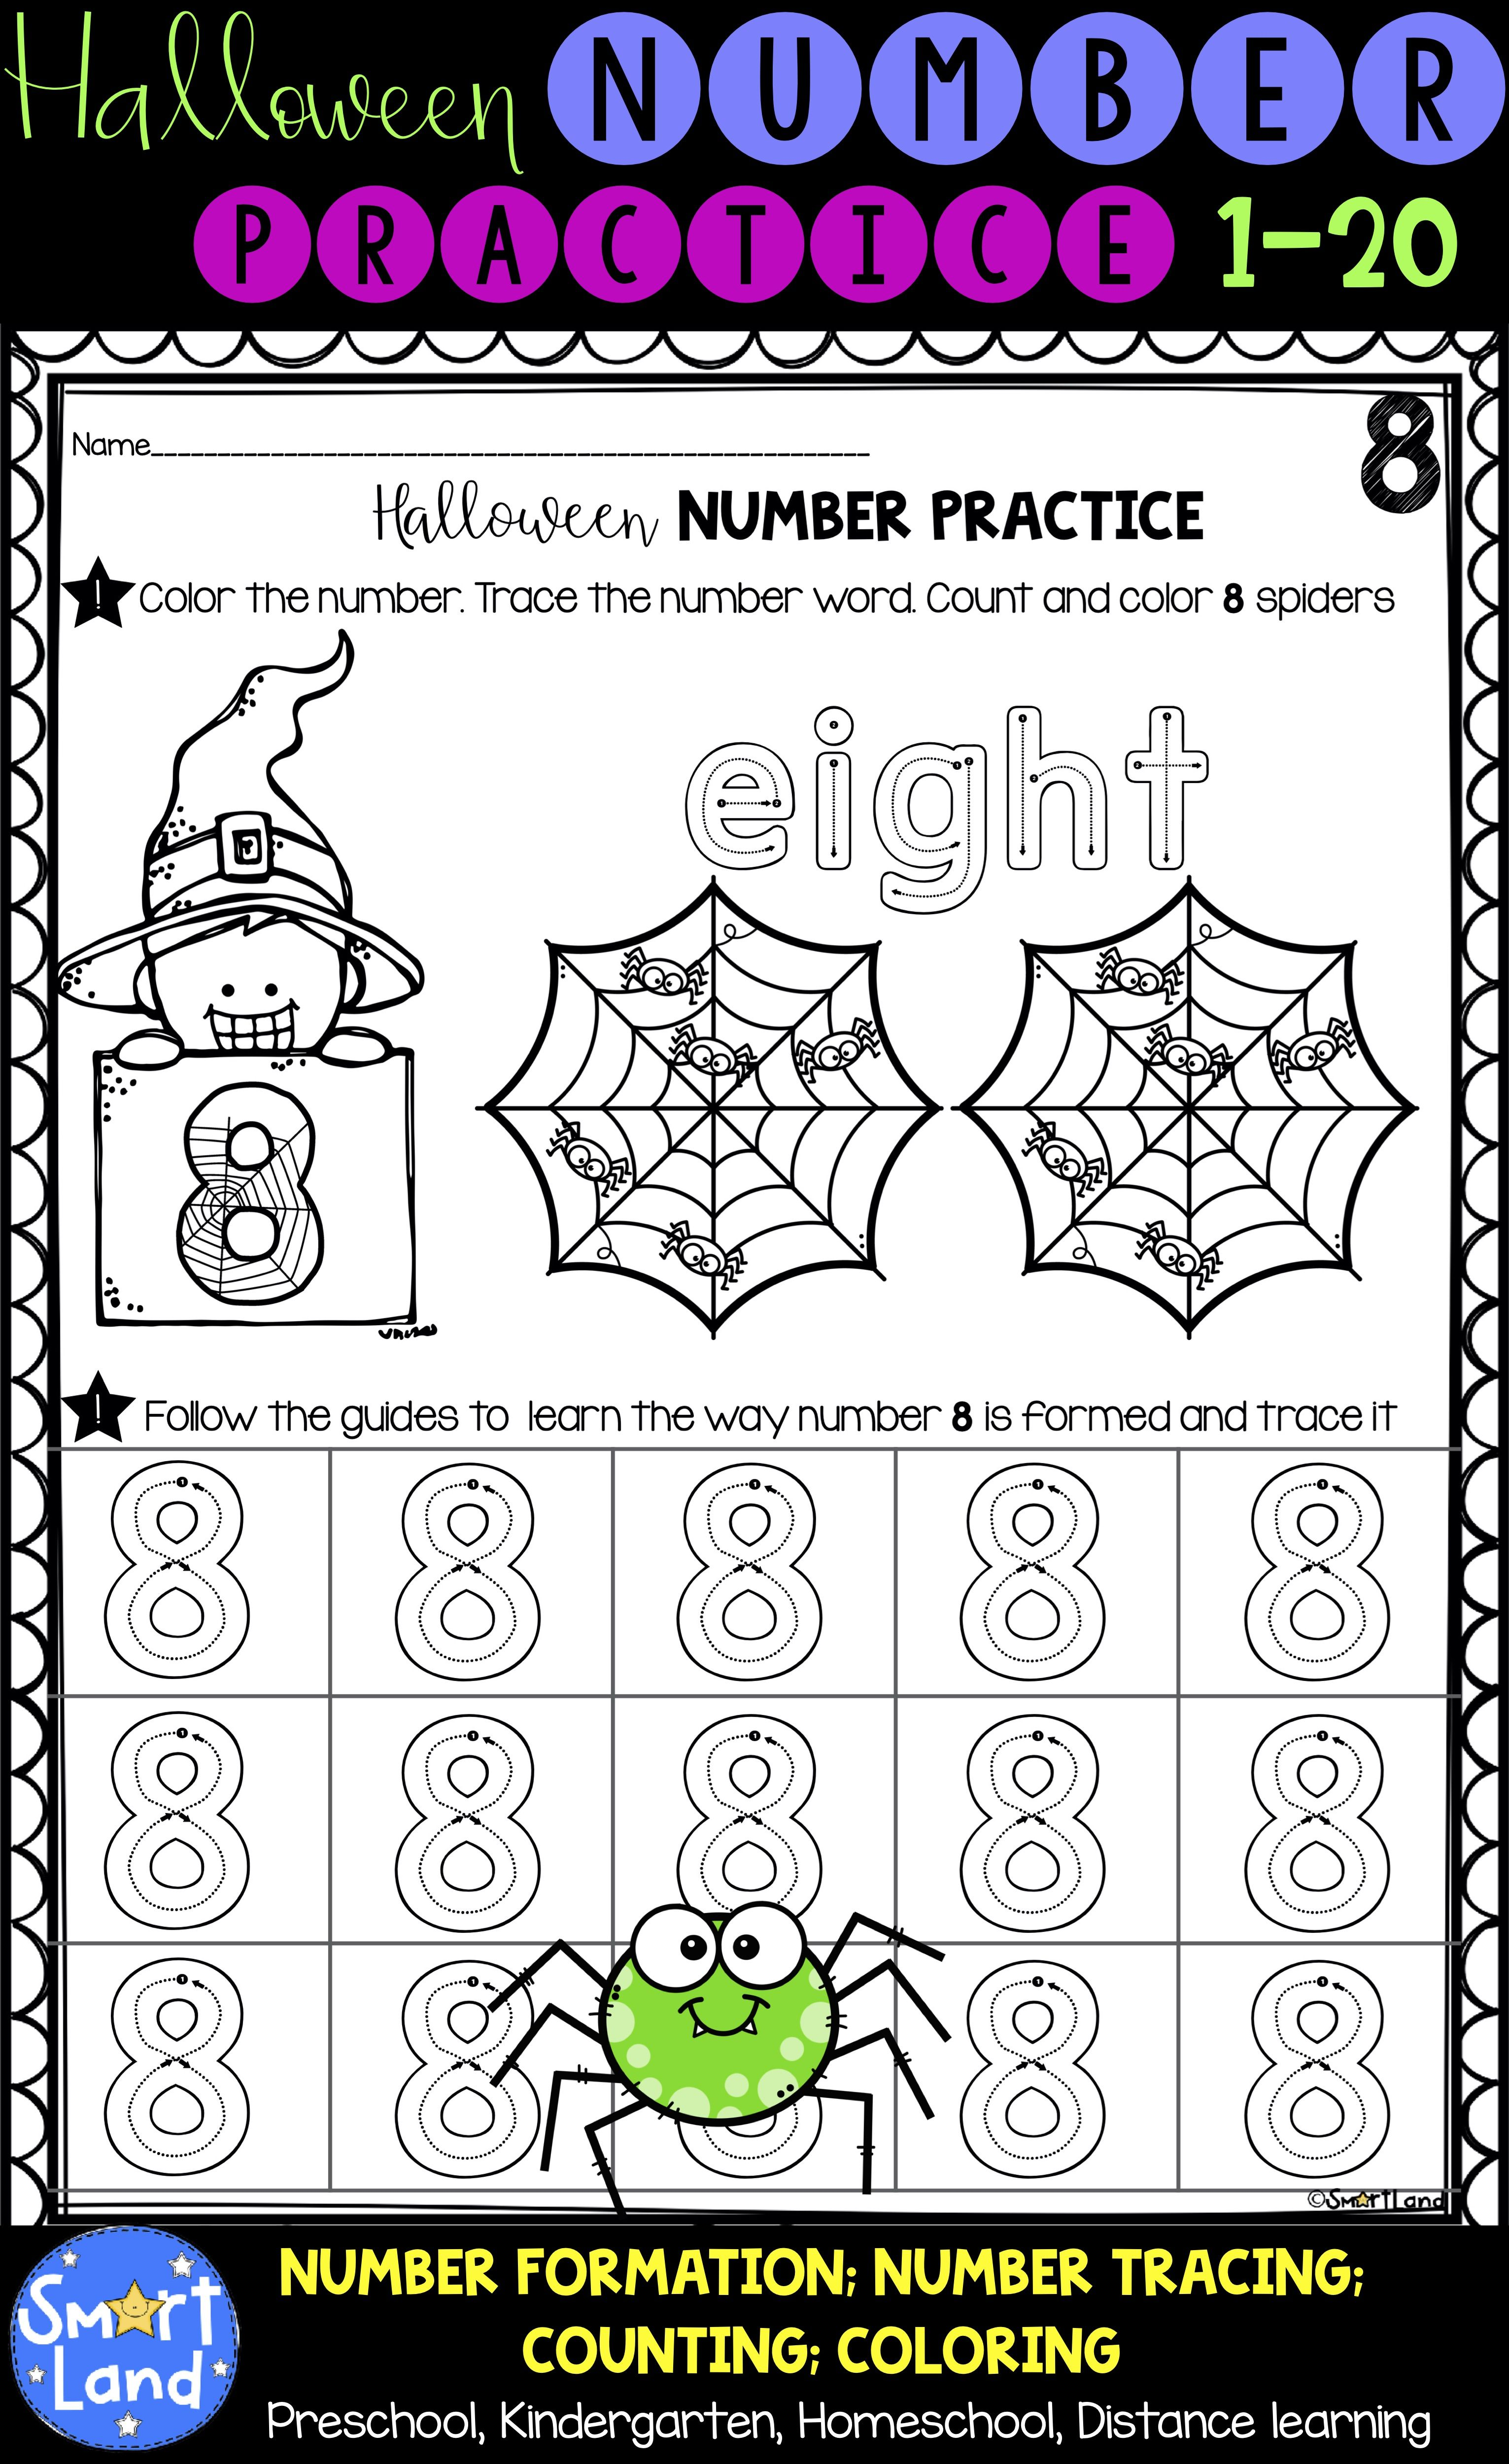 Halloween Numbers 1 20 Handwriting And Counting Worksheets Fall Preschool Activities Halloween Worksheets Preschool Math Worksheets [ 5000 x 3062 Pixel ]